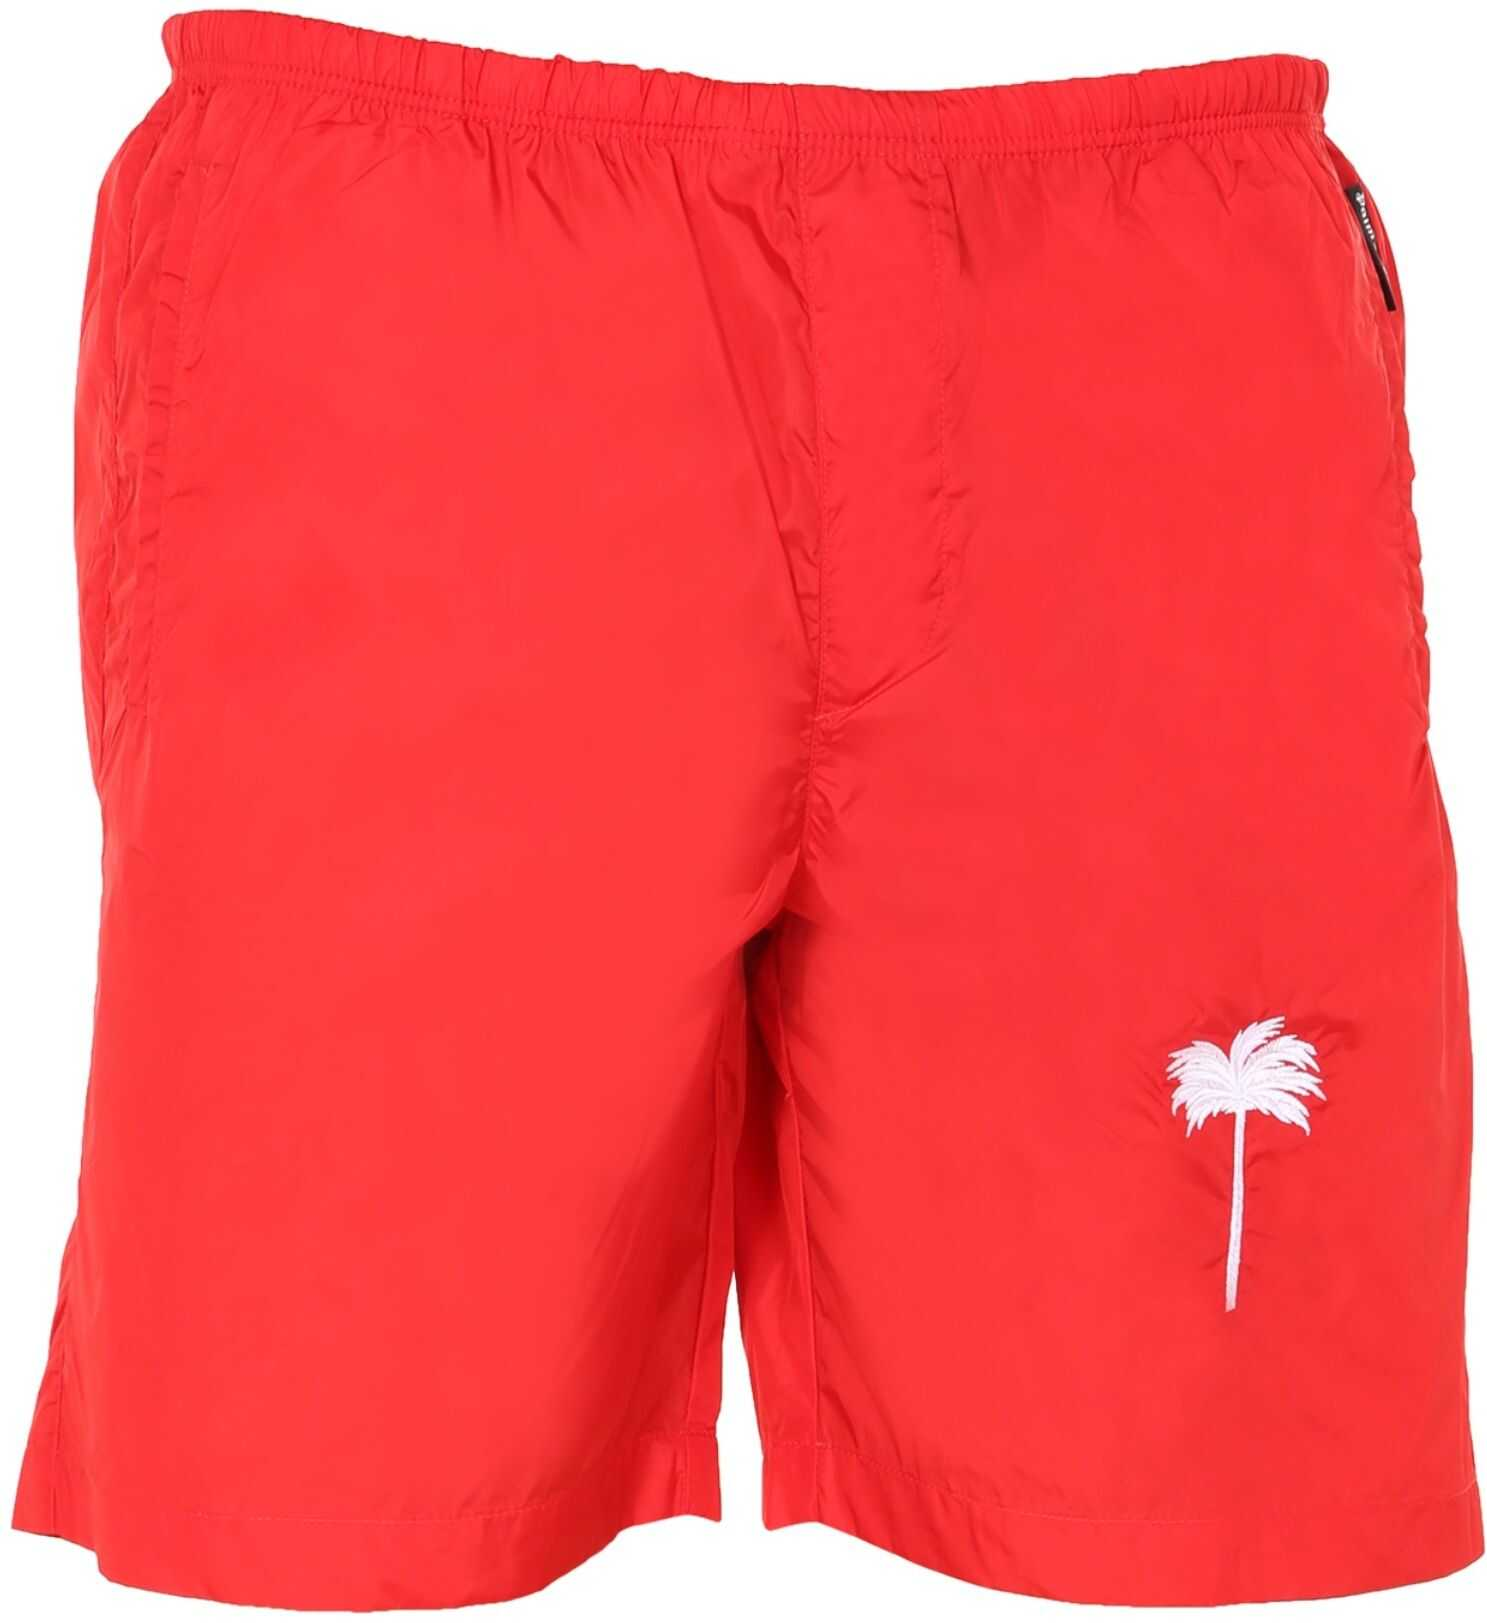 Palm Angels Medium Swimsuit RED